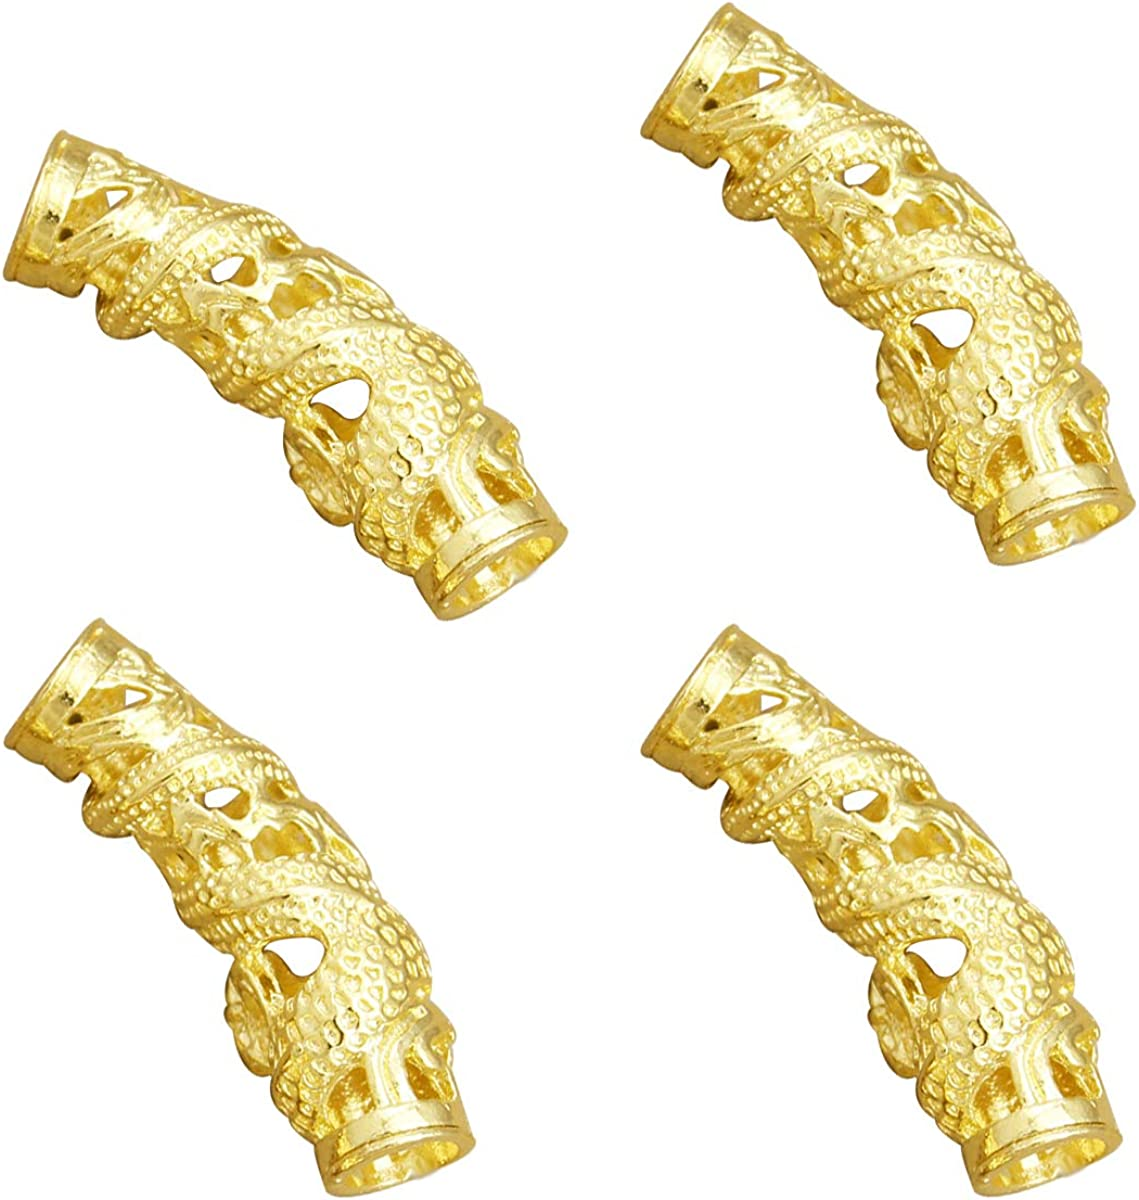 5pcs//Set Retro Alloy Viking Dreadlock Beads Braided Hole Beads Hair Rings New LS